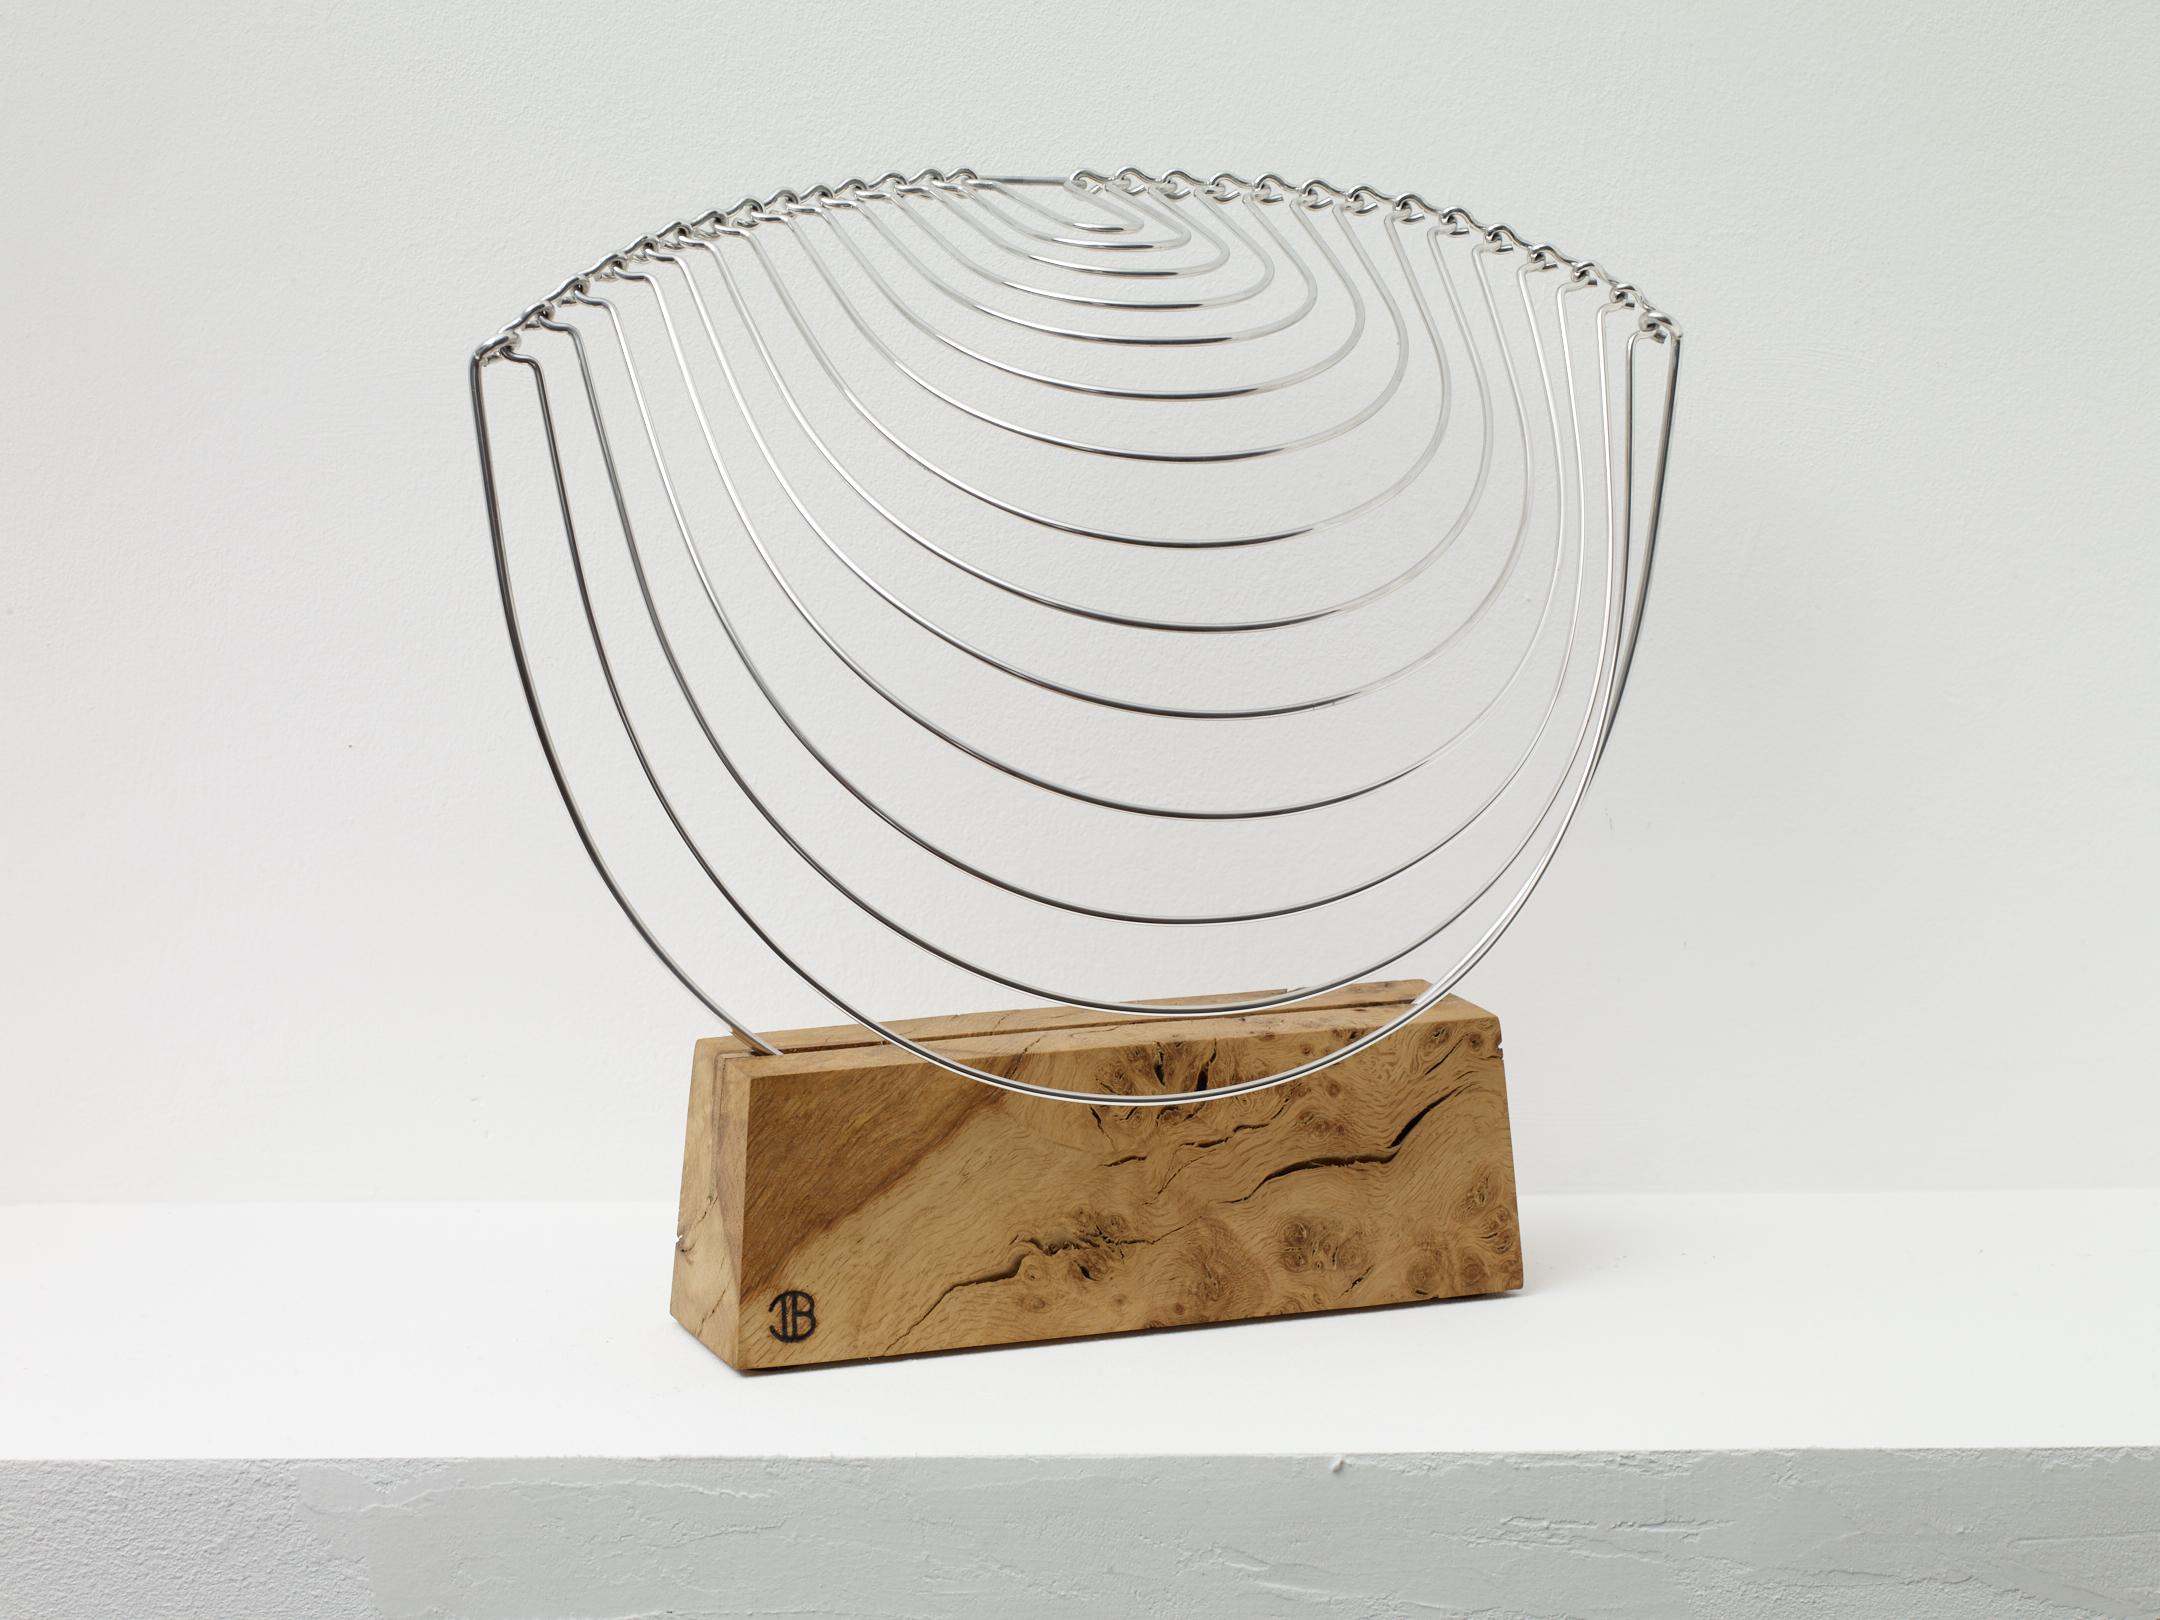 Ivan Black  Loop Wave,  2018 Aluminium and burr oak 30 x 27 cm Edition 2 of 10